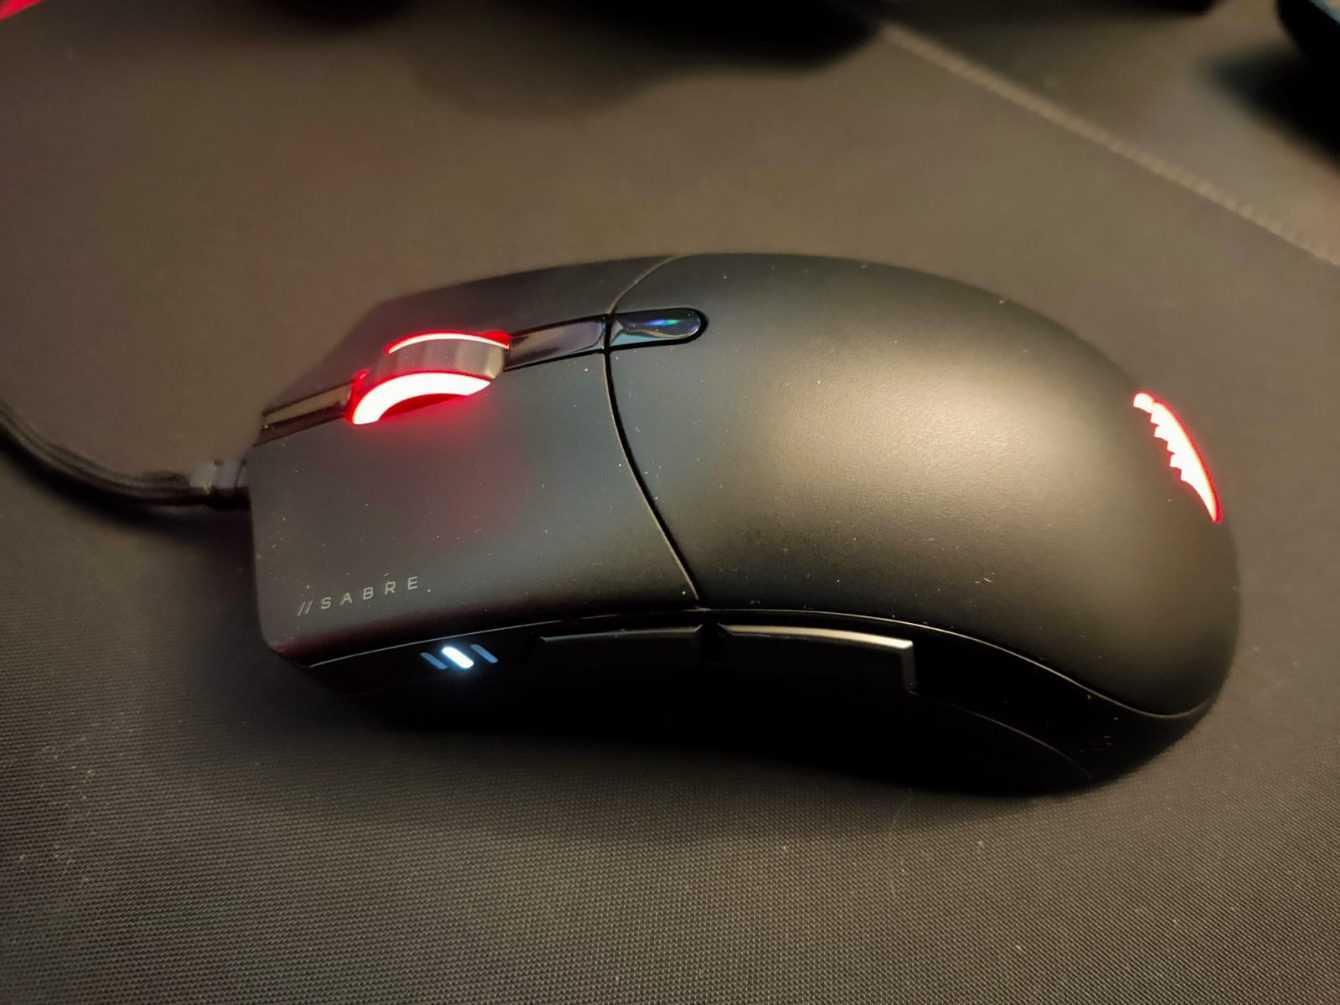 Recensione Corsair SABRE RGB PRO: un mouse competitivo